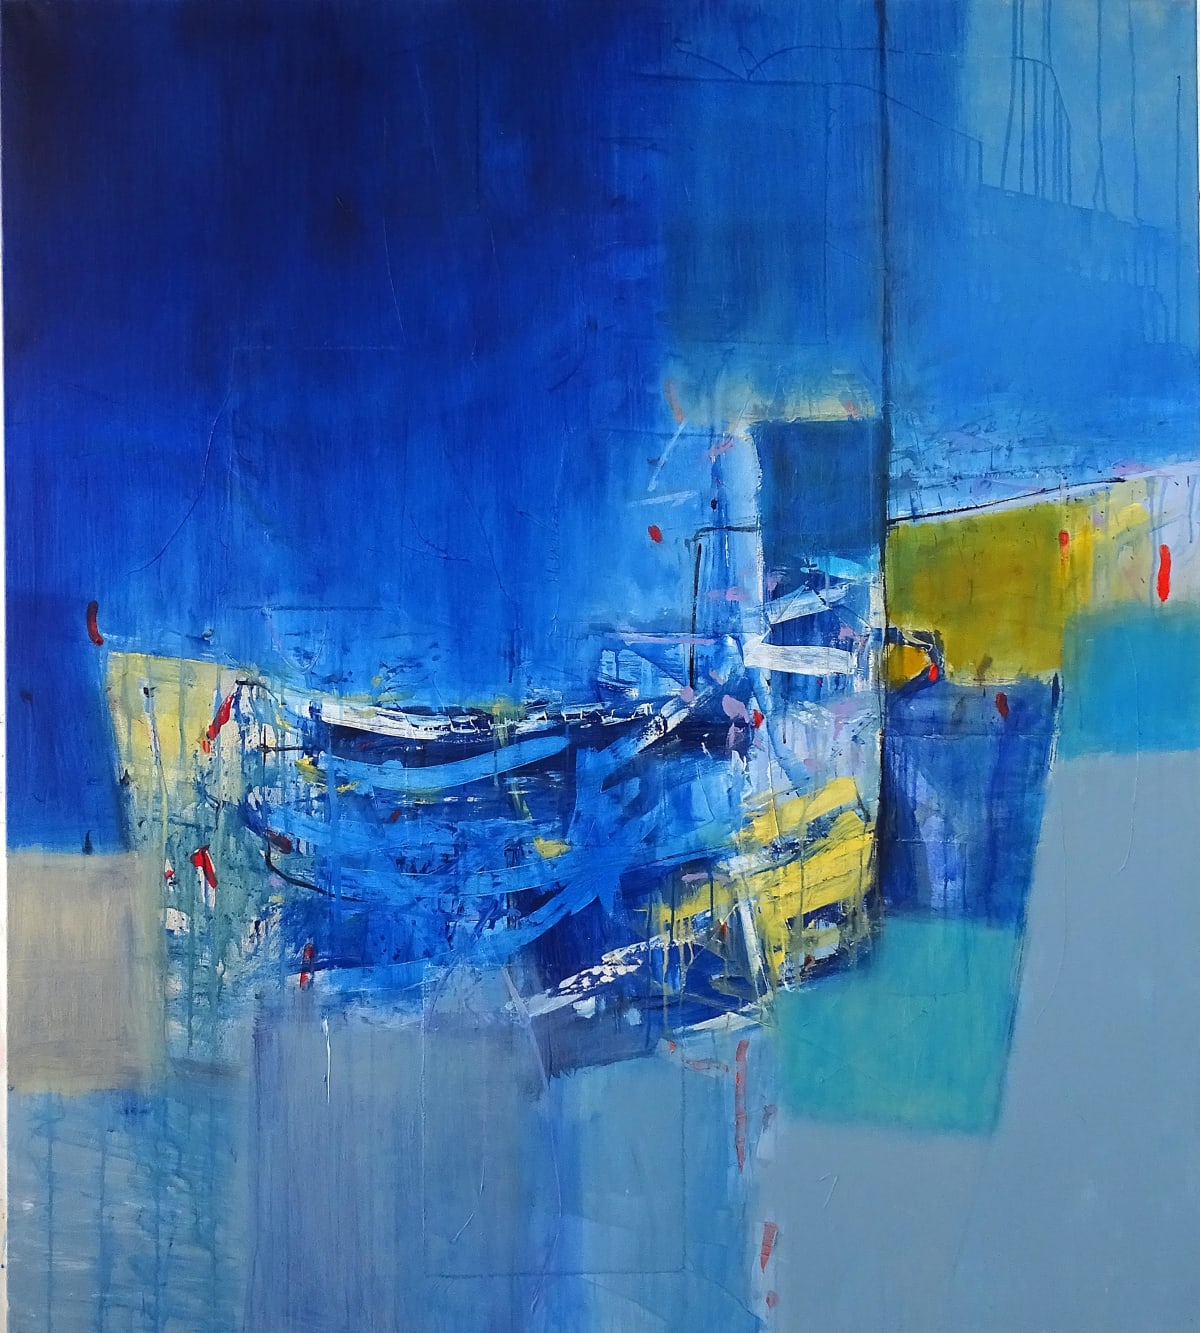 Martyn Brewster, Blue Horizon no. 2, 2019